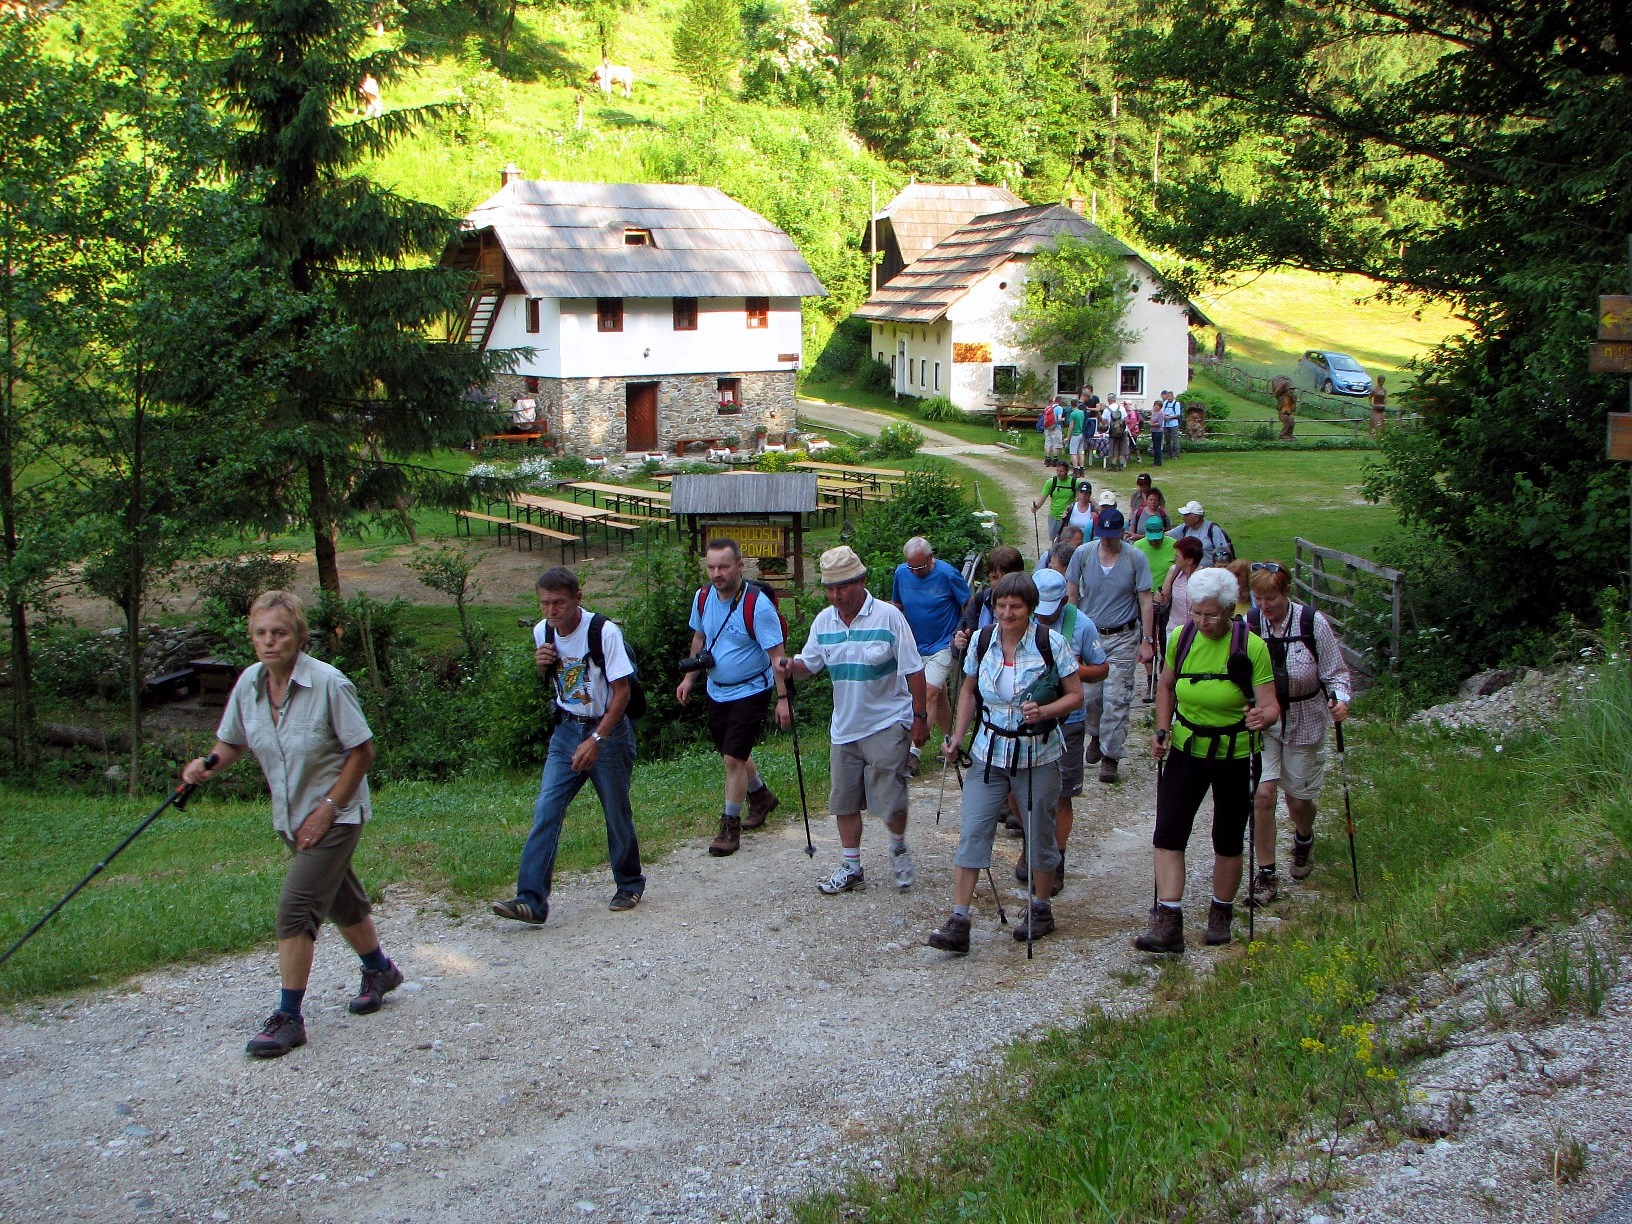 Prijavite se za 10. voden pohod po Mlinarski poti (Koroška)